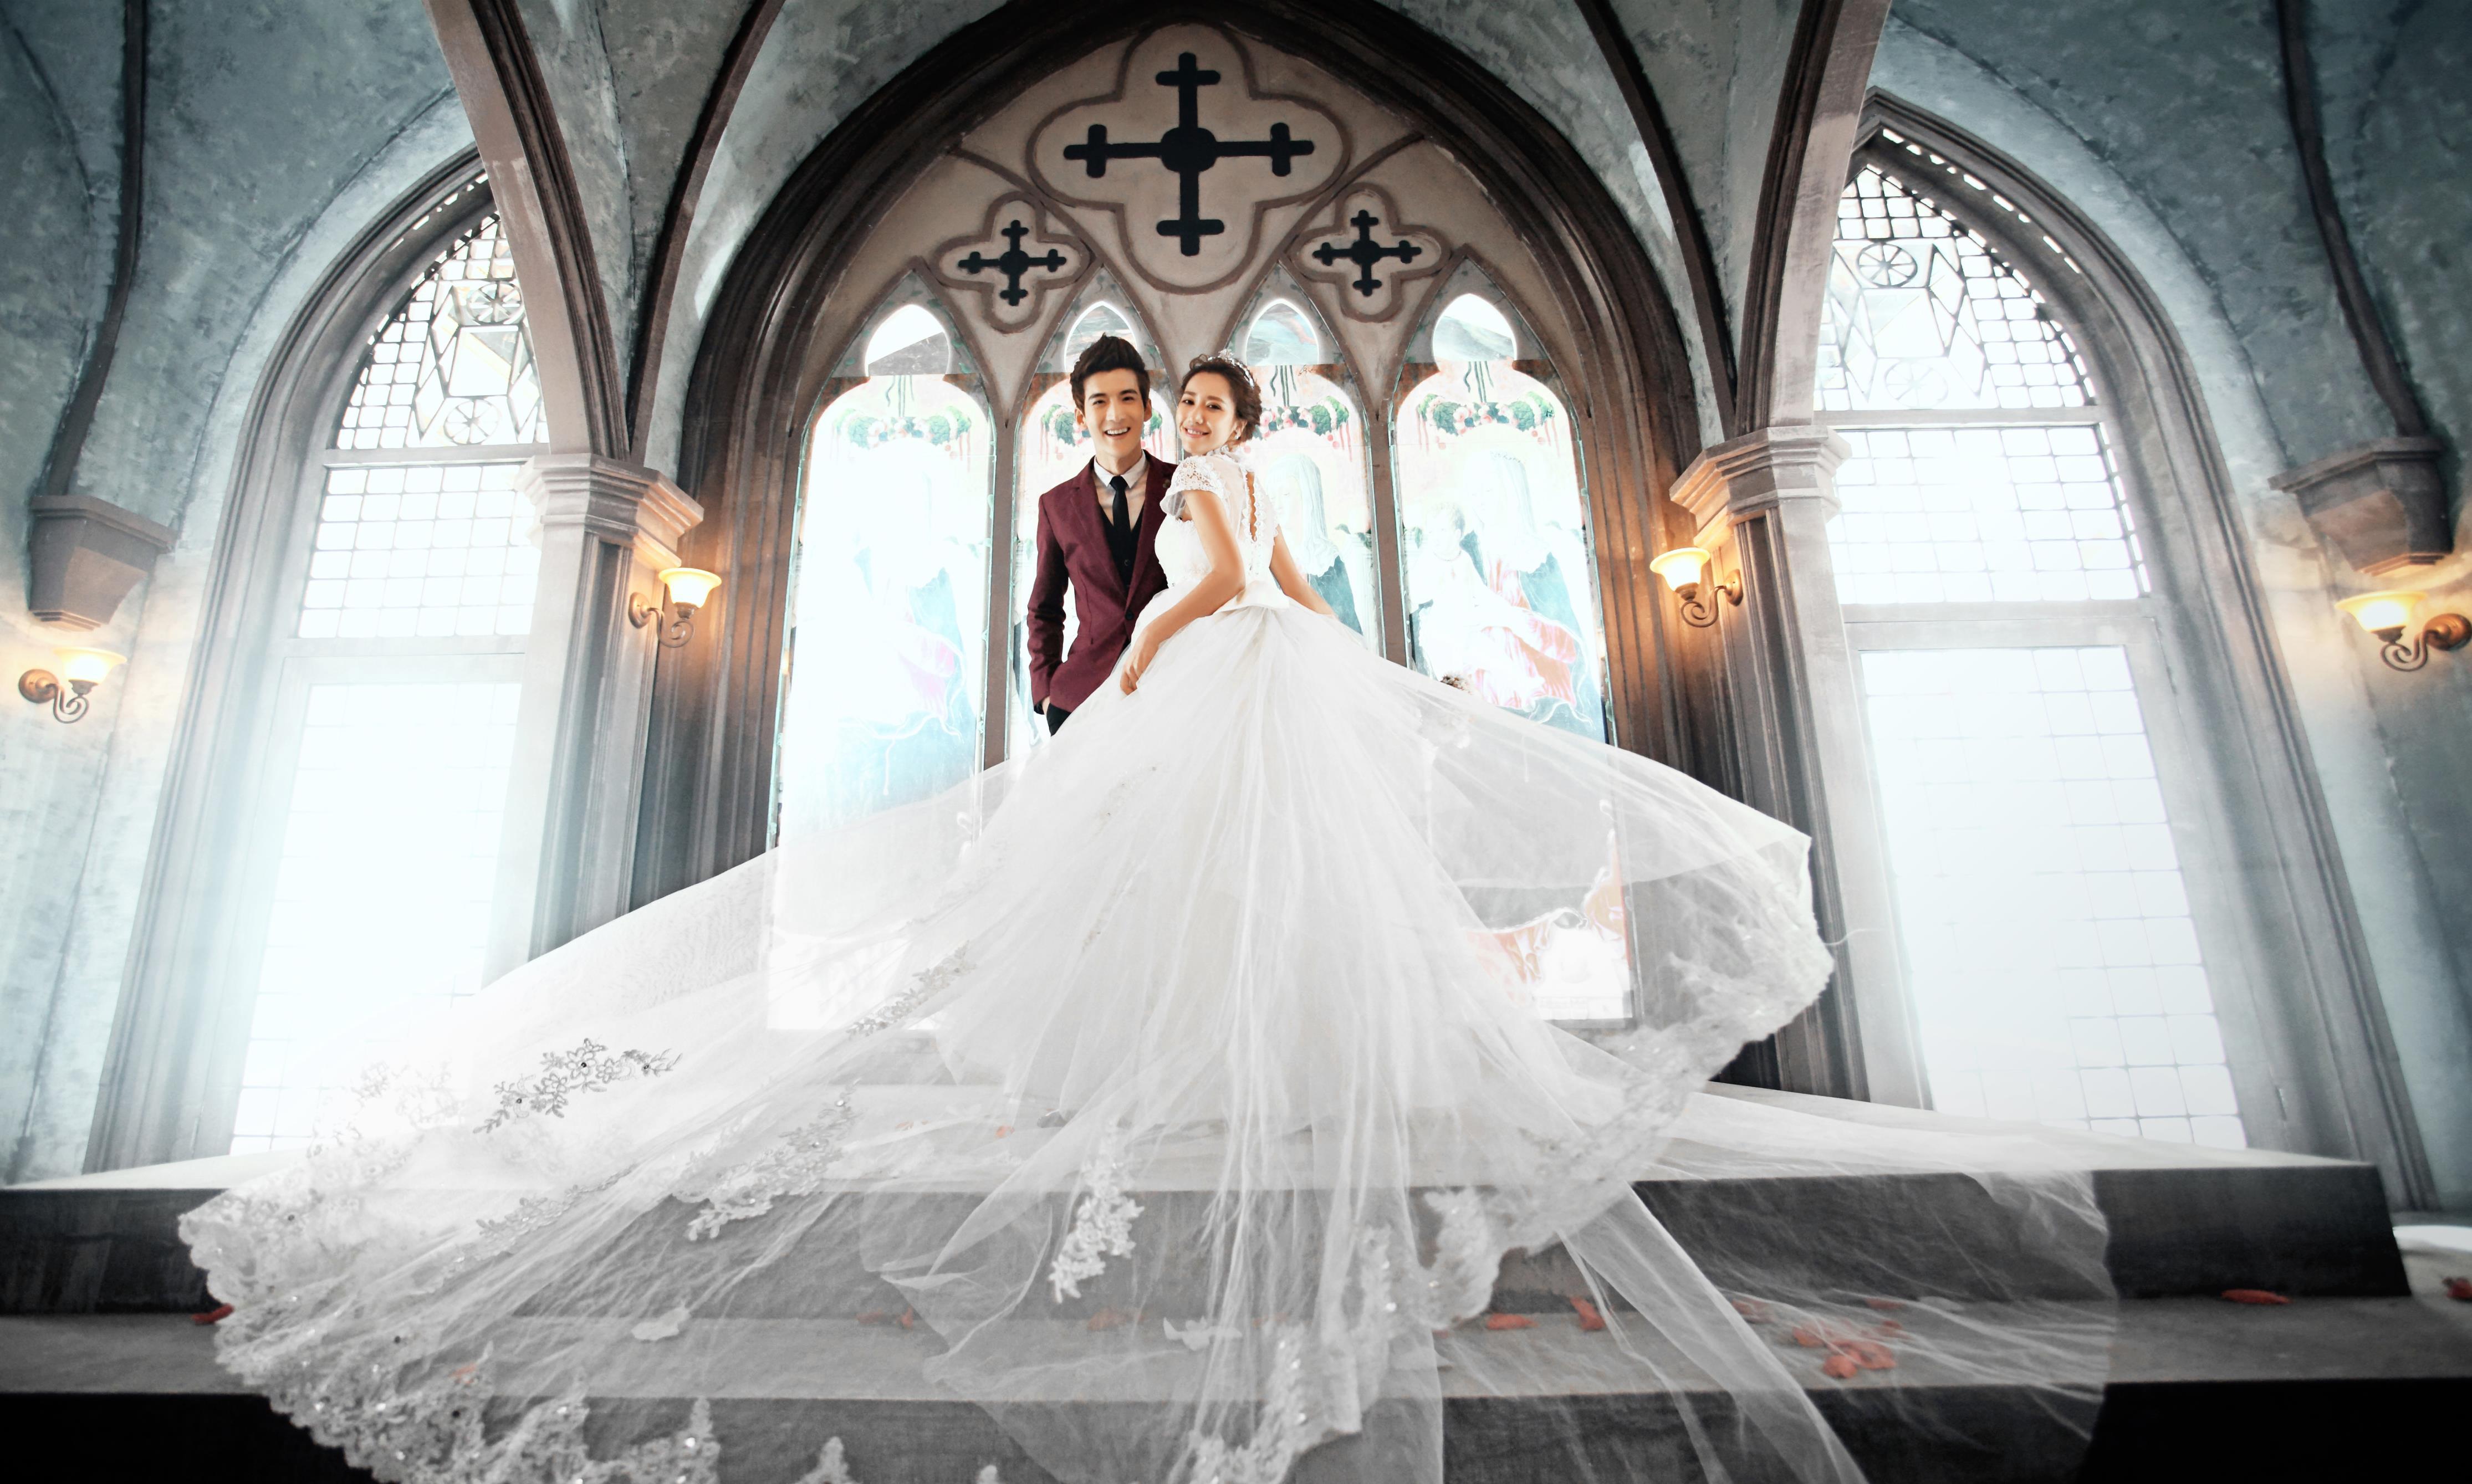 ido婚纱摄影加盟